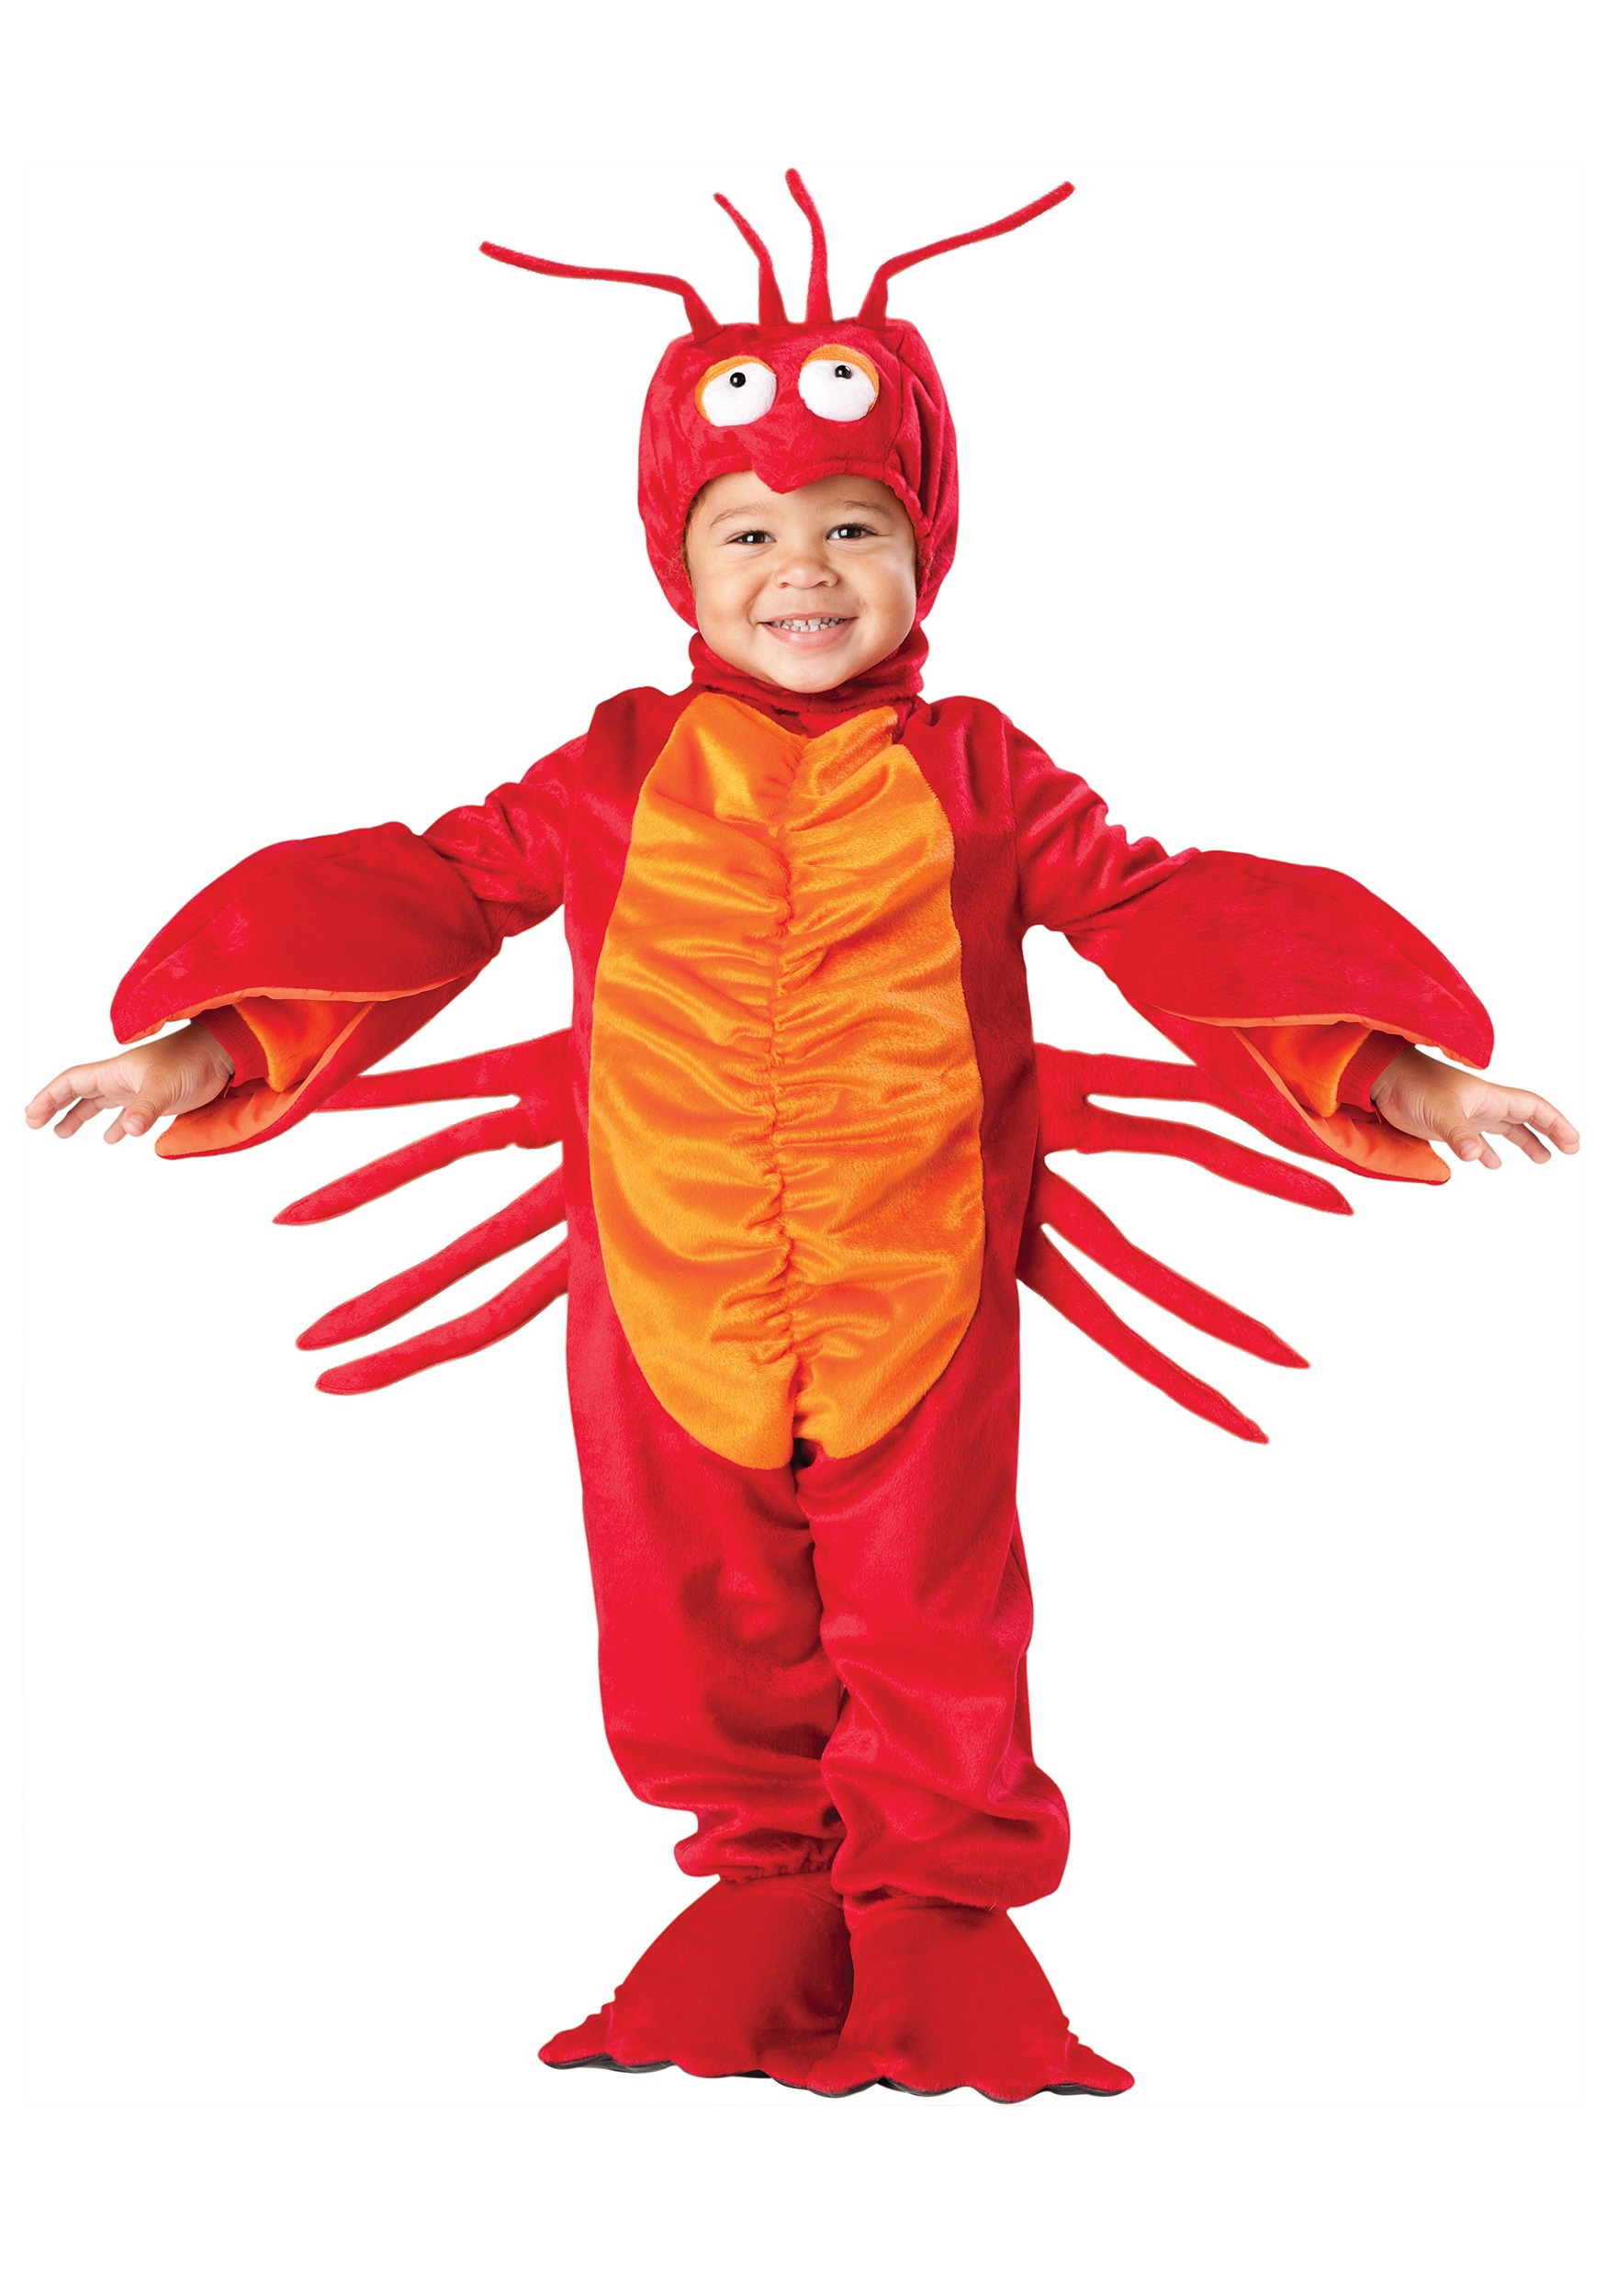 Toddler Lil Lobster Costume  sc 1 st  Halloween Costumes & Toddler Lil Lobster Costume - Halloween Costumes